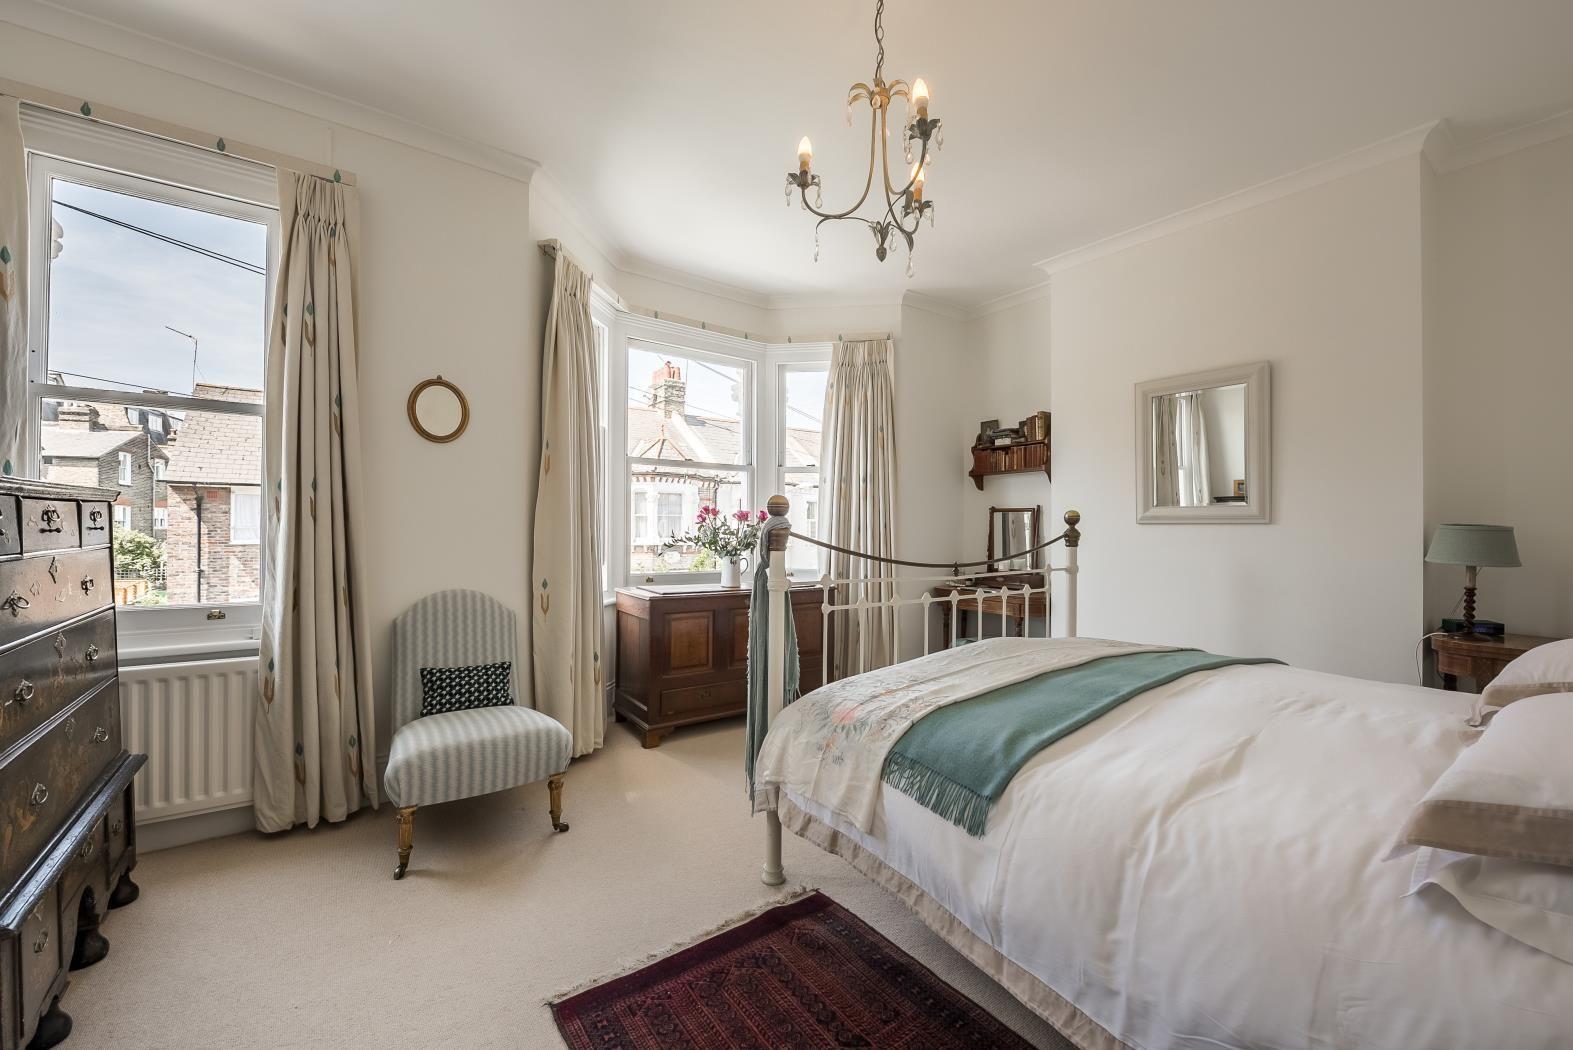 bedroom house under offer in stormont road sw